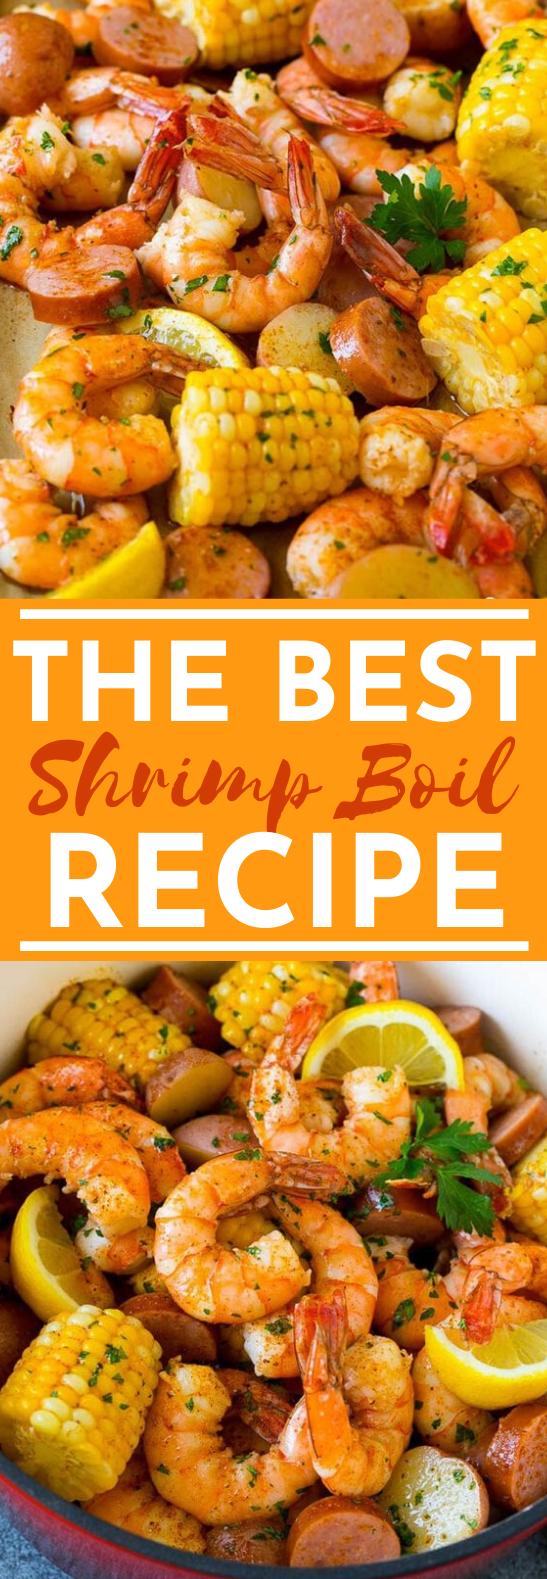 Shrimp Boil #dinner #seafood #shrimp #easy #recipes